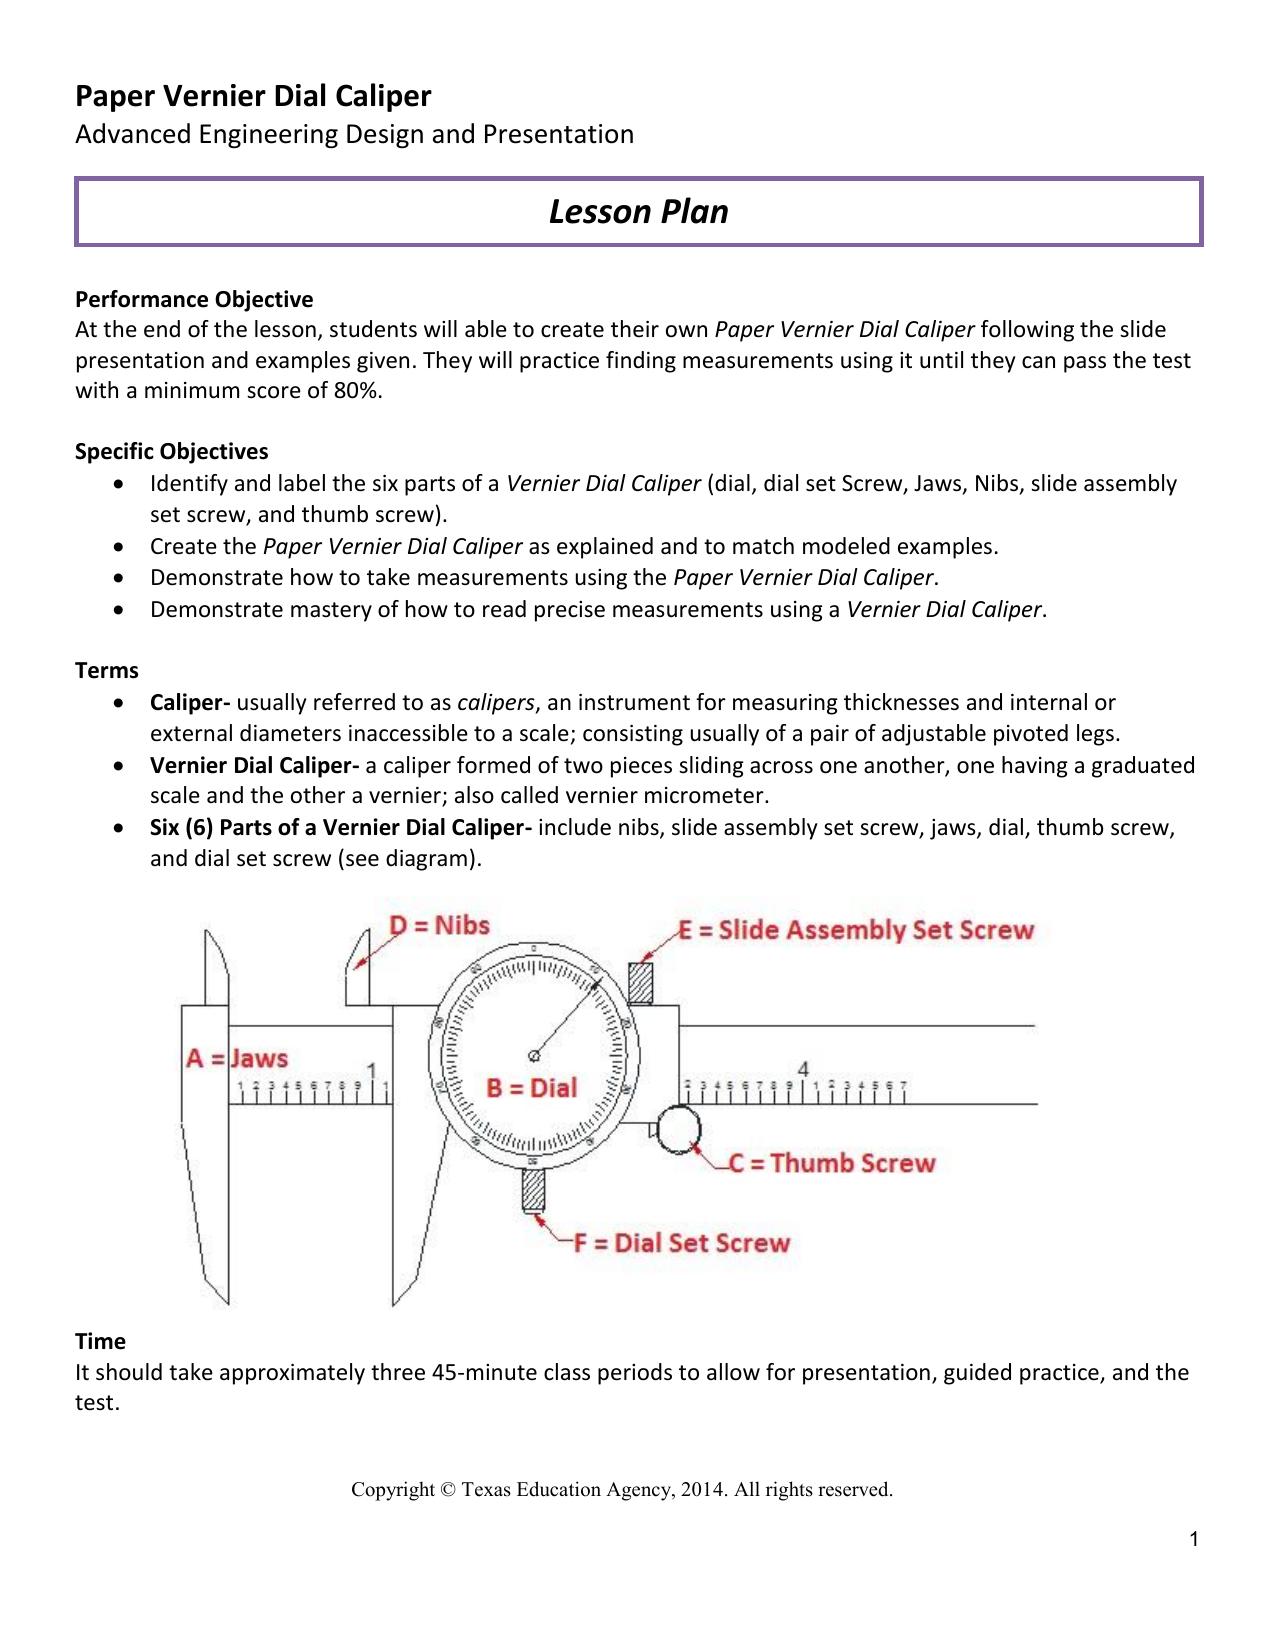 Fabulous Lesson Plan Paper Vernier Dial Caliper Advanced Engineering Design Wiring Cloud Intapioscosaoduqqnet